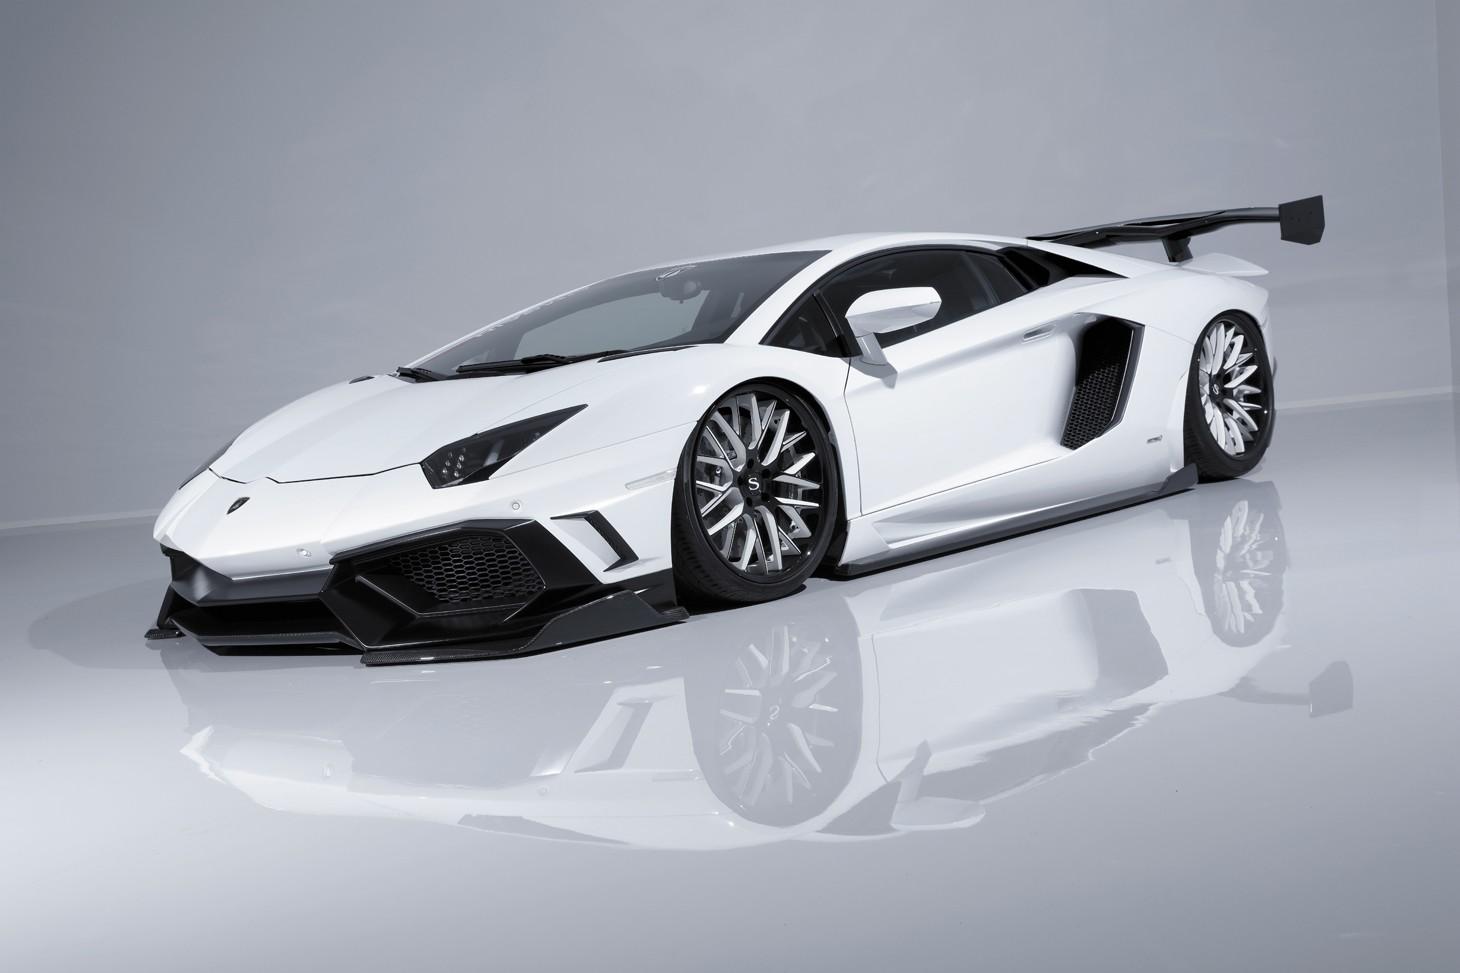 Widebody Drift Car Wallpaper Aimgain Gt Lamborghini Aventador Is From Japan Autoevolution